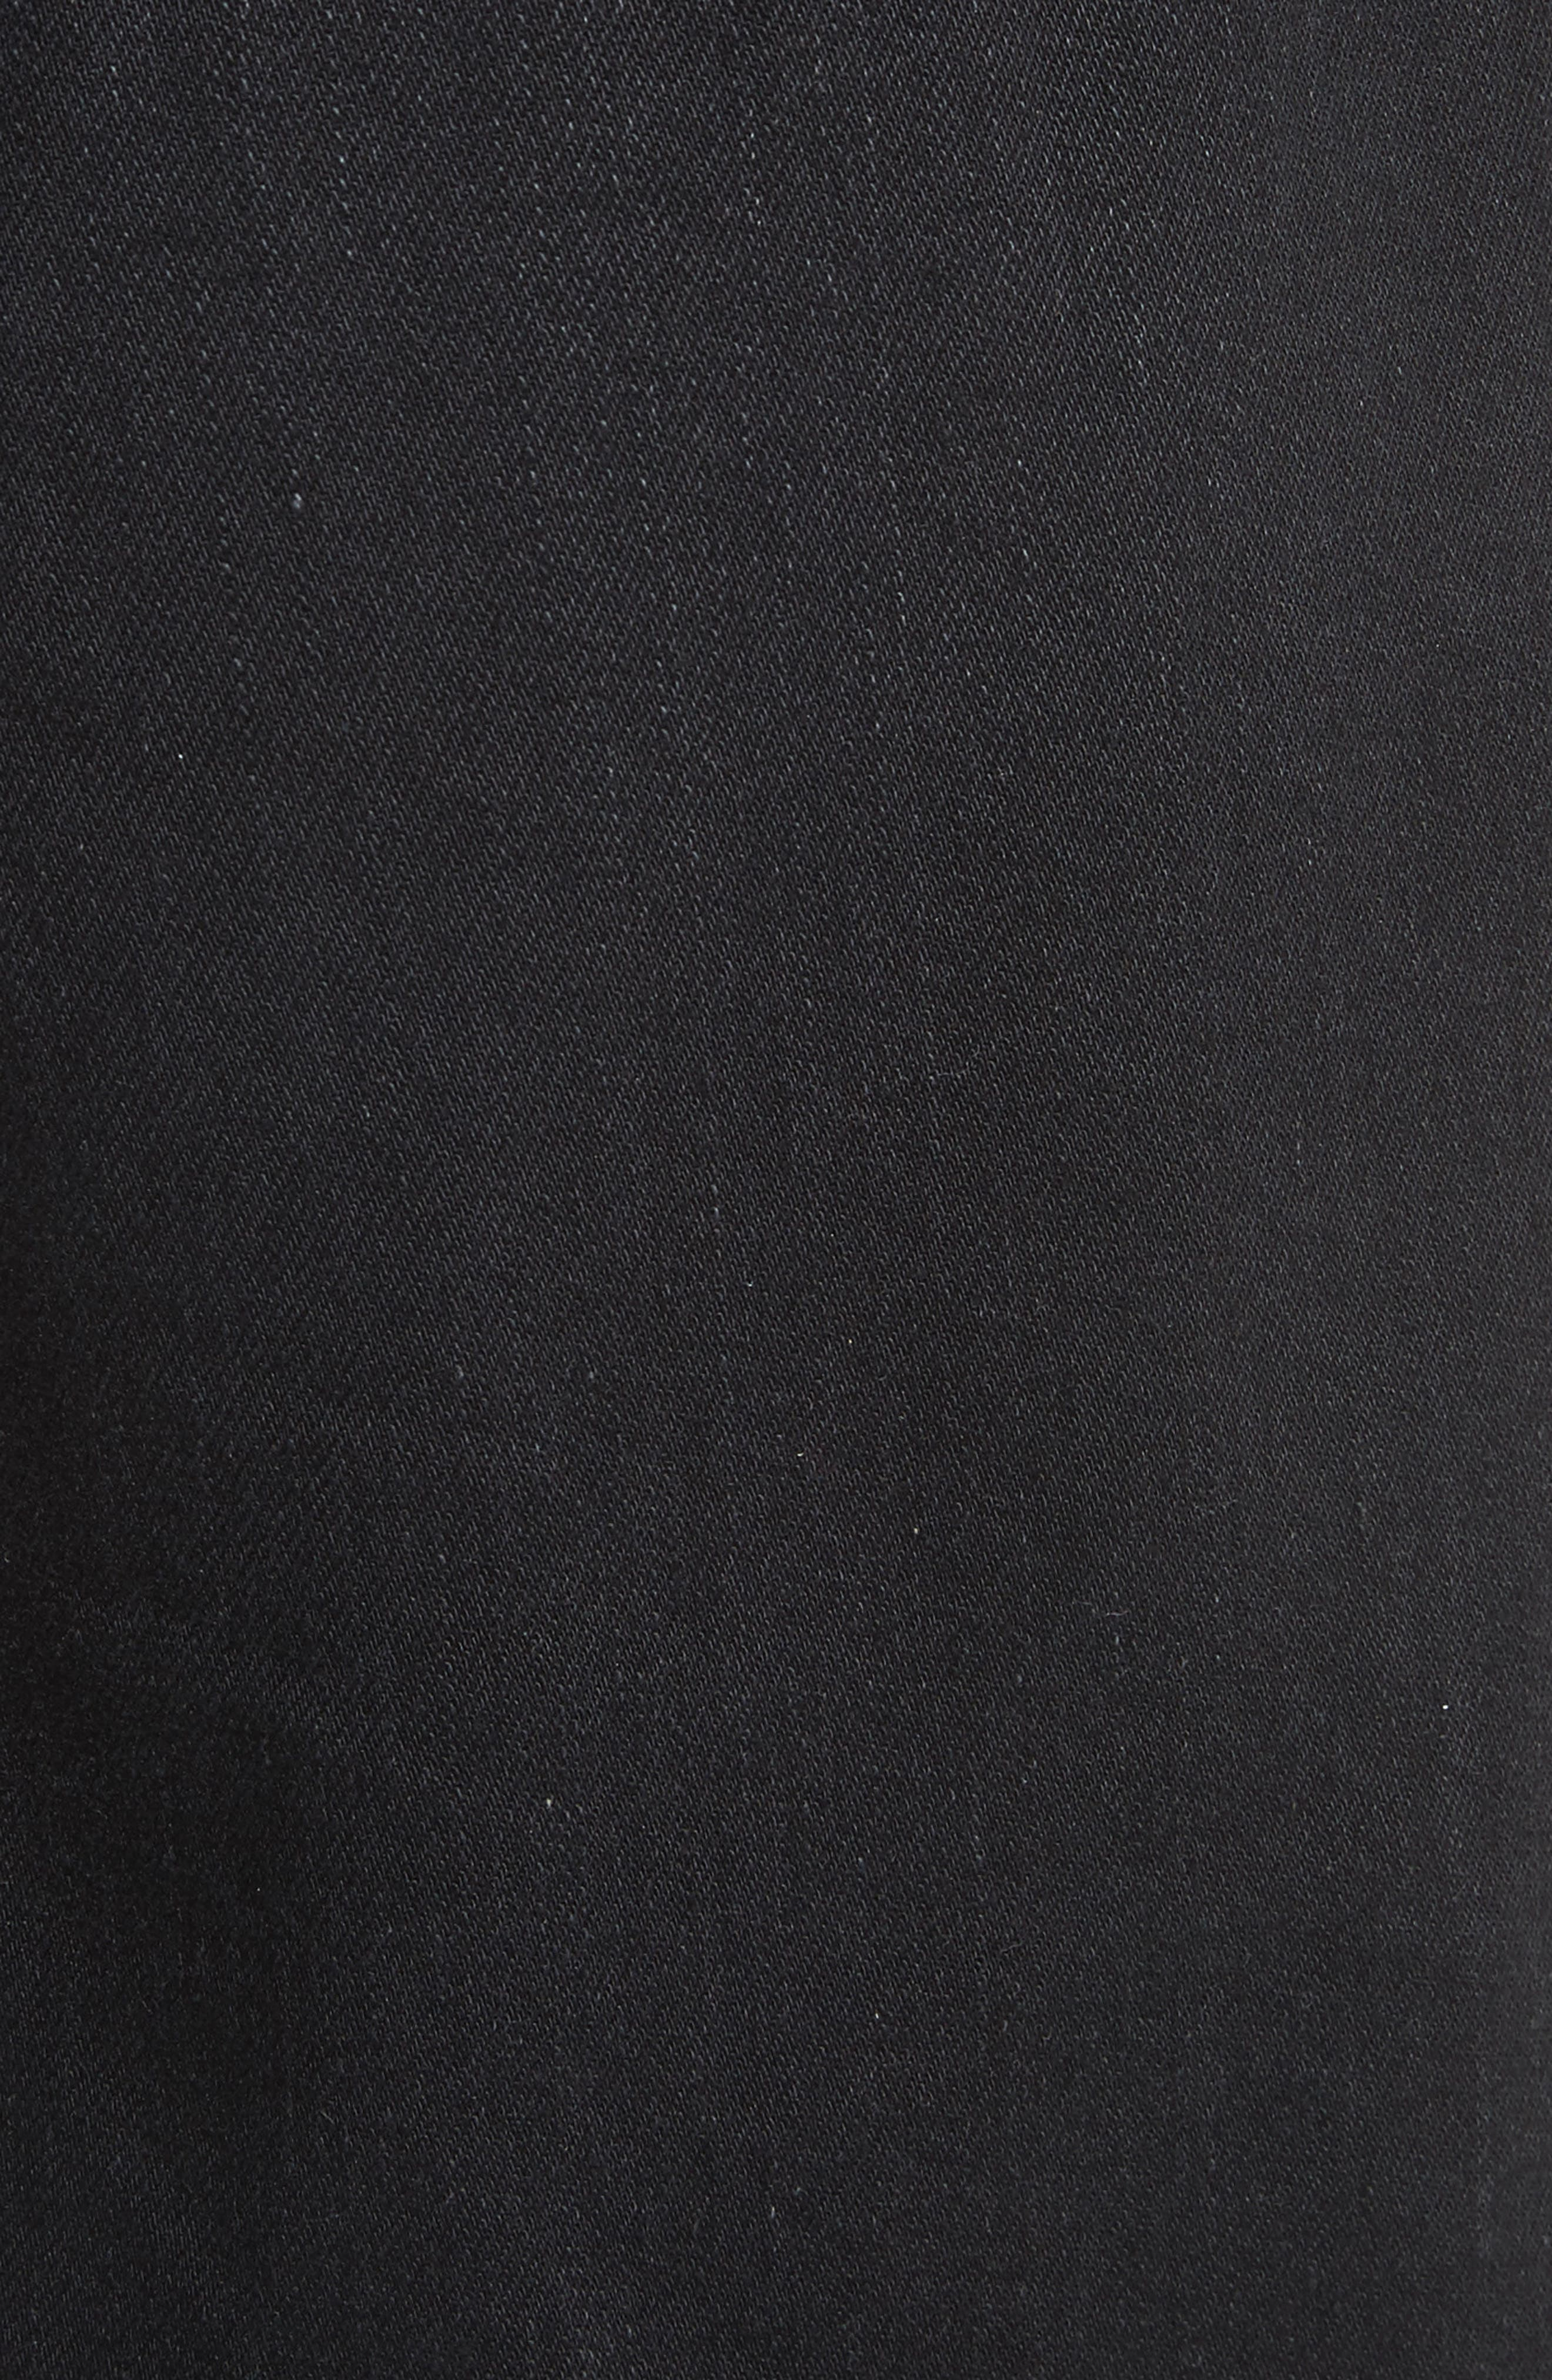 Denim x Alexander Wang Frayed Miniskirt,                             Alternate thumbnail 5, color,                             Black Fade